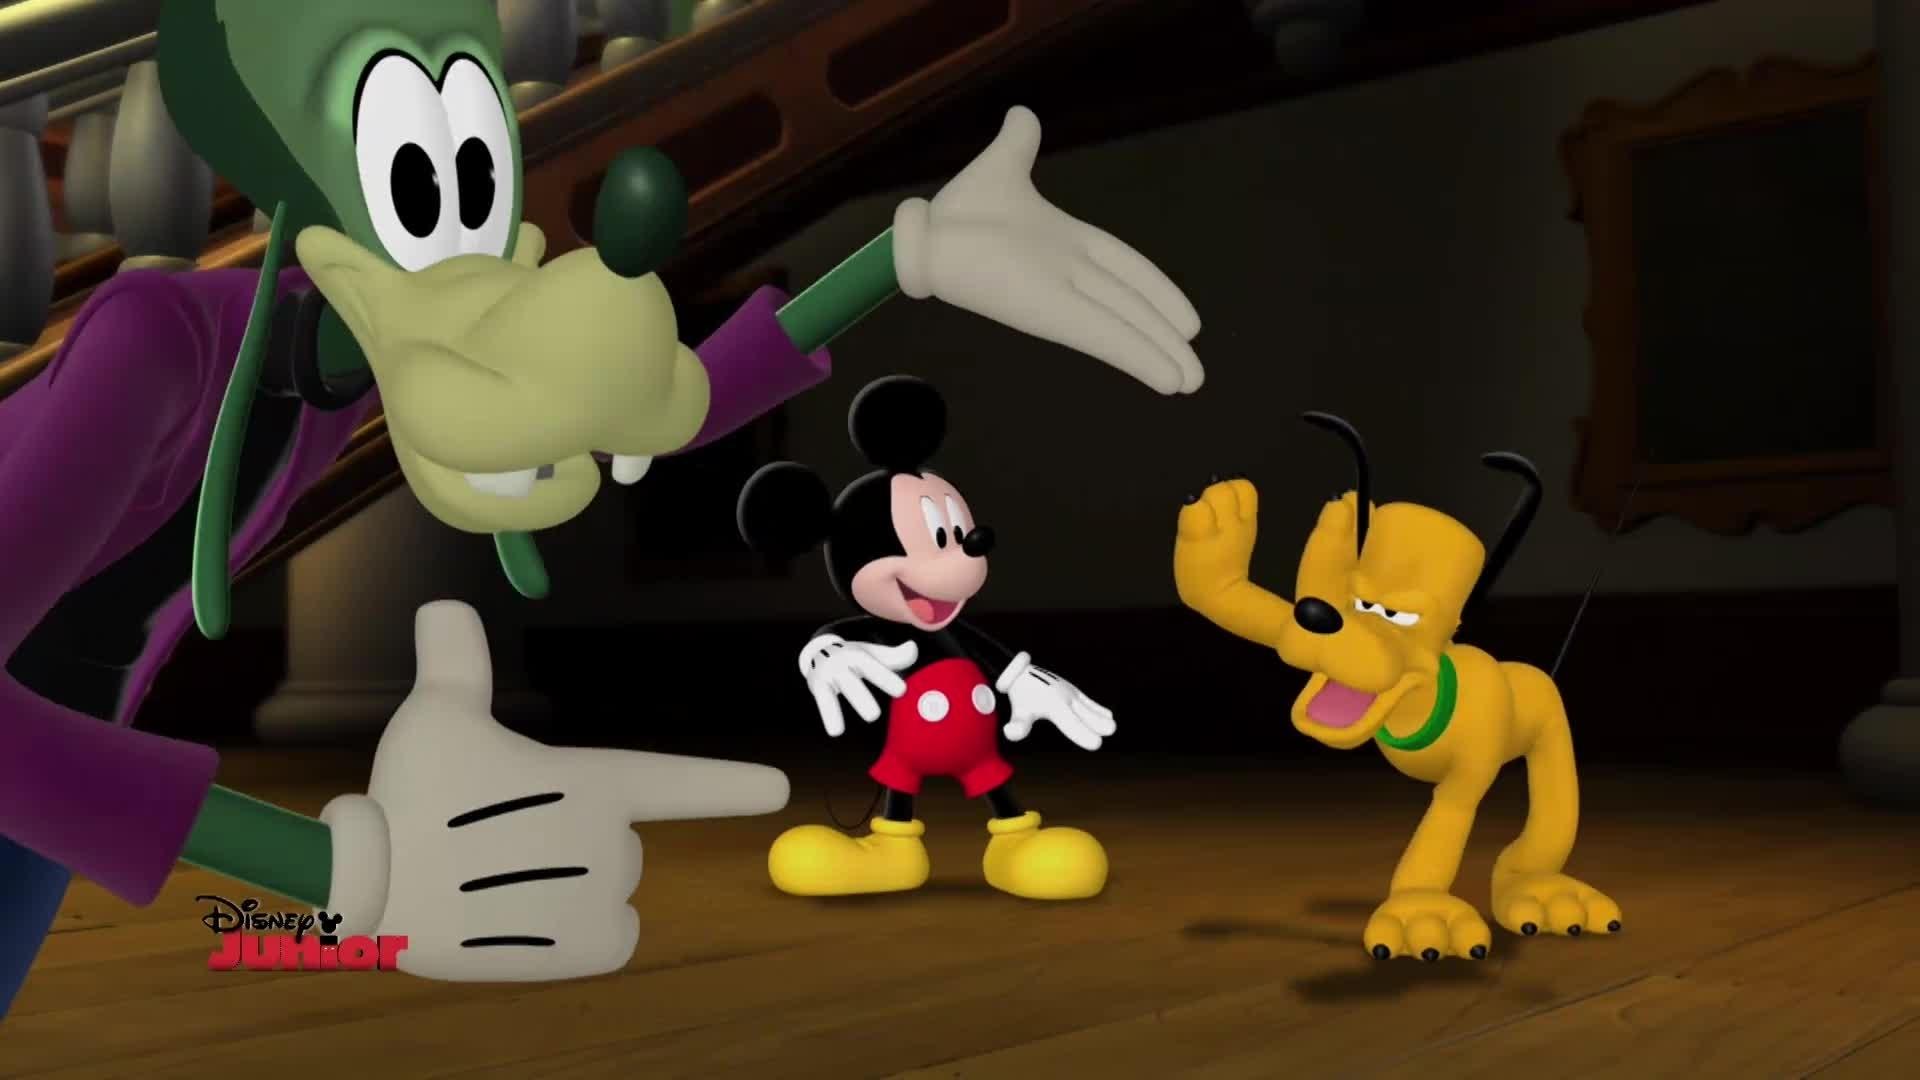 Der Micky Maus Wunderhaus Halloweensong